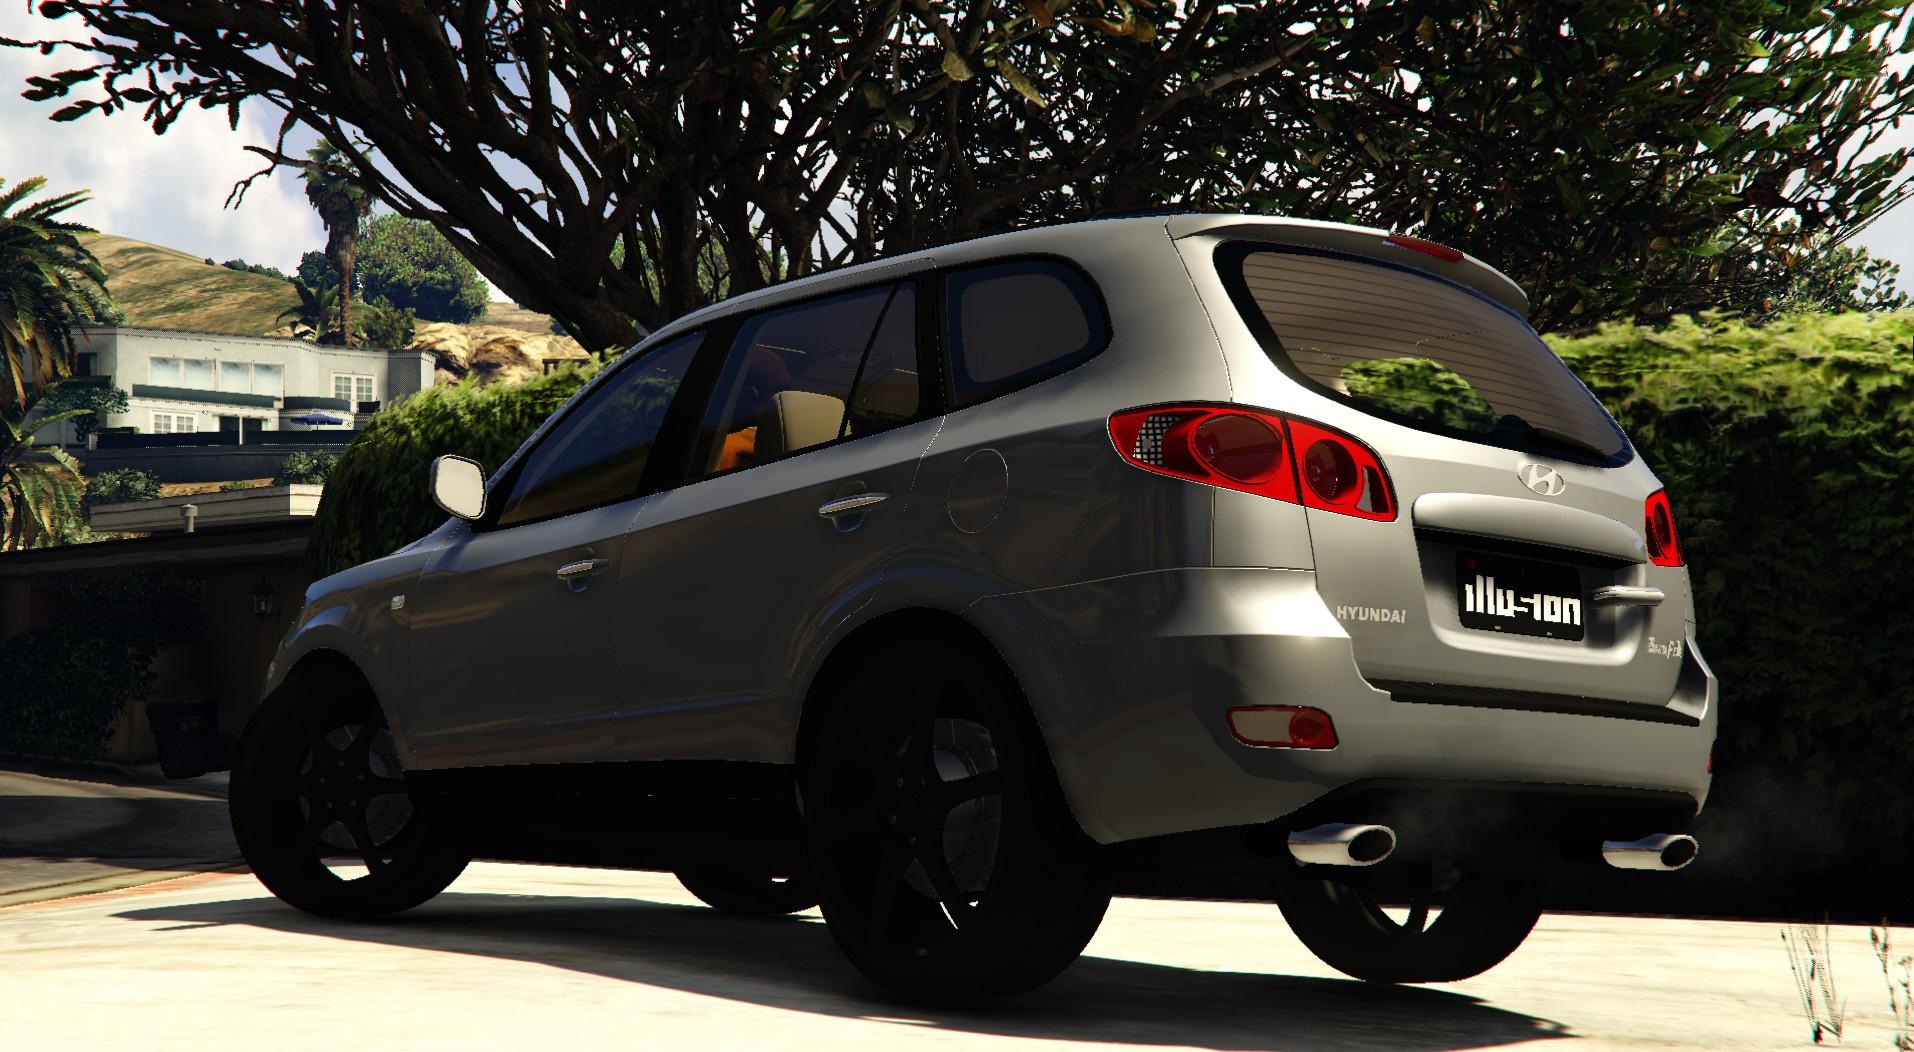 2016 Hyundai Santa Fe >> 2010 Hyundai Santa Fé - GTA5-Mods.com